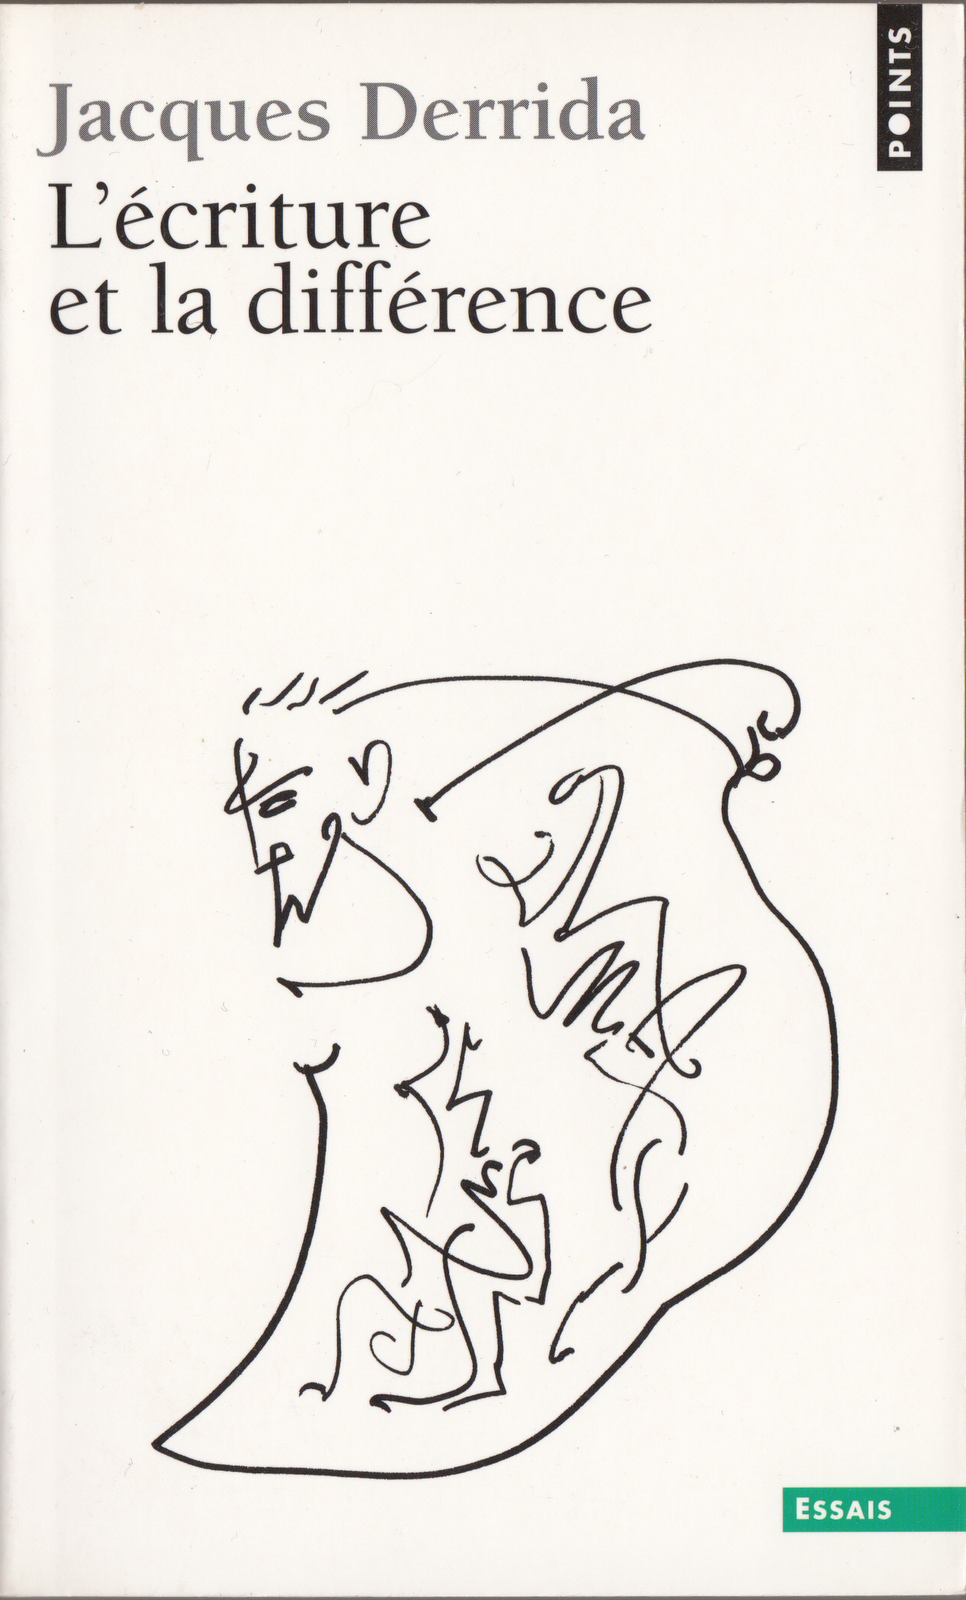 Derrida Jacques La Escritua De La Diferencia Frances Deconstrucción Adolfo Vásquez Rocca Phd Lecture Gratuite Livre De Lecture Livres En Ligne